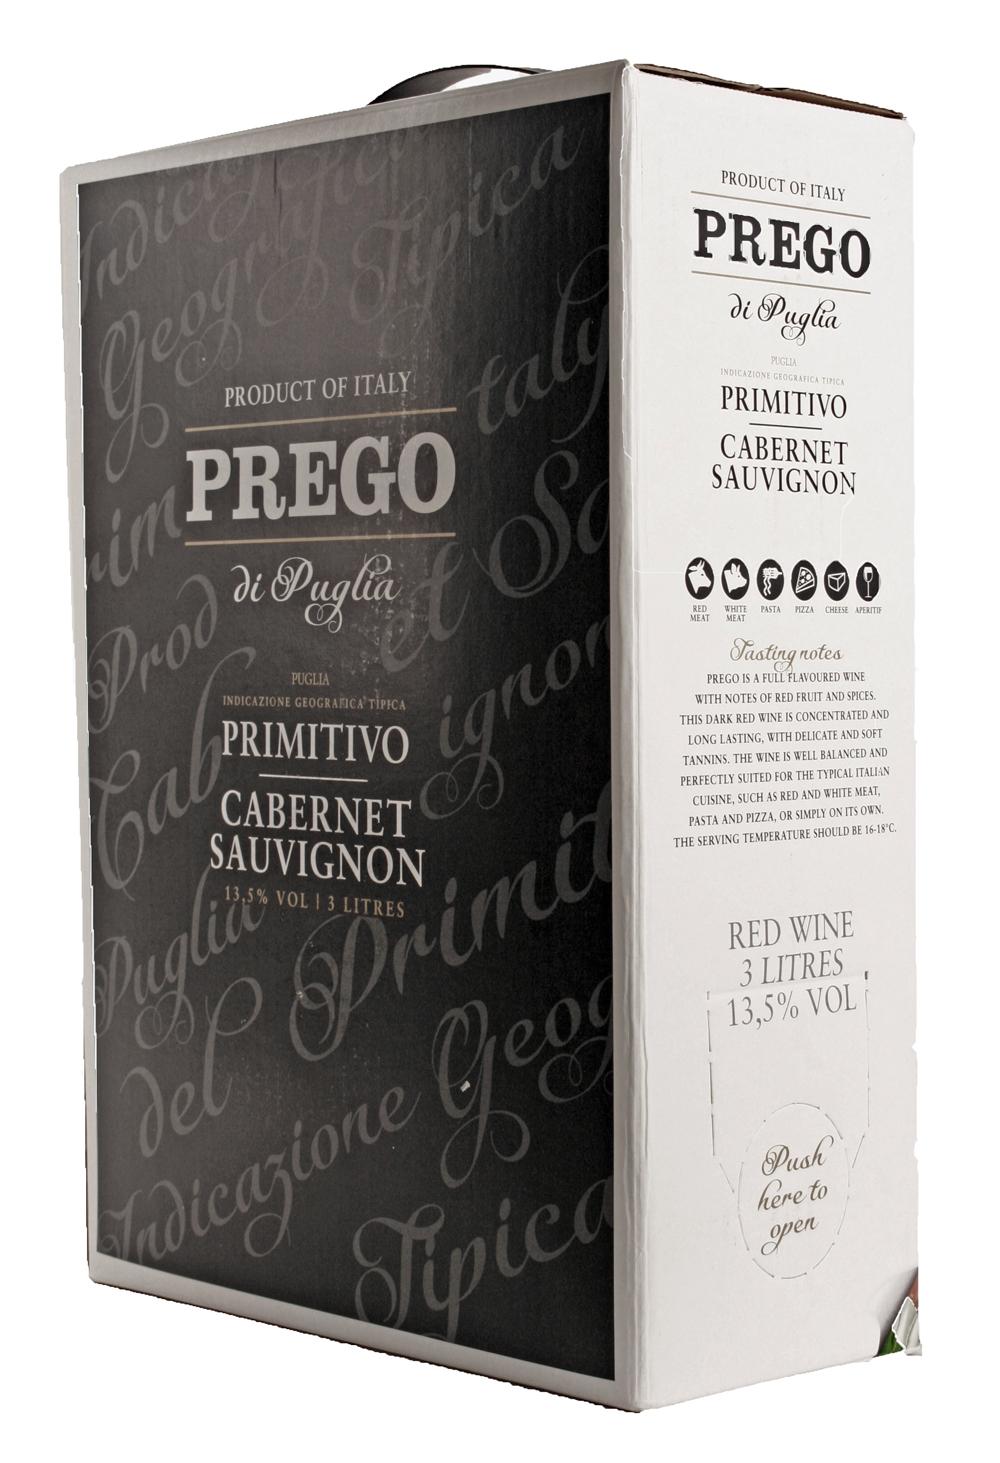 RL VVS Prego profile 1